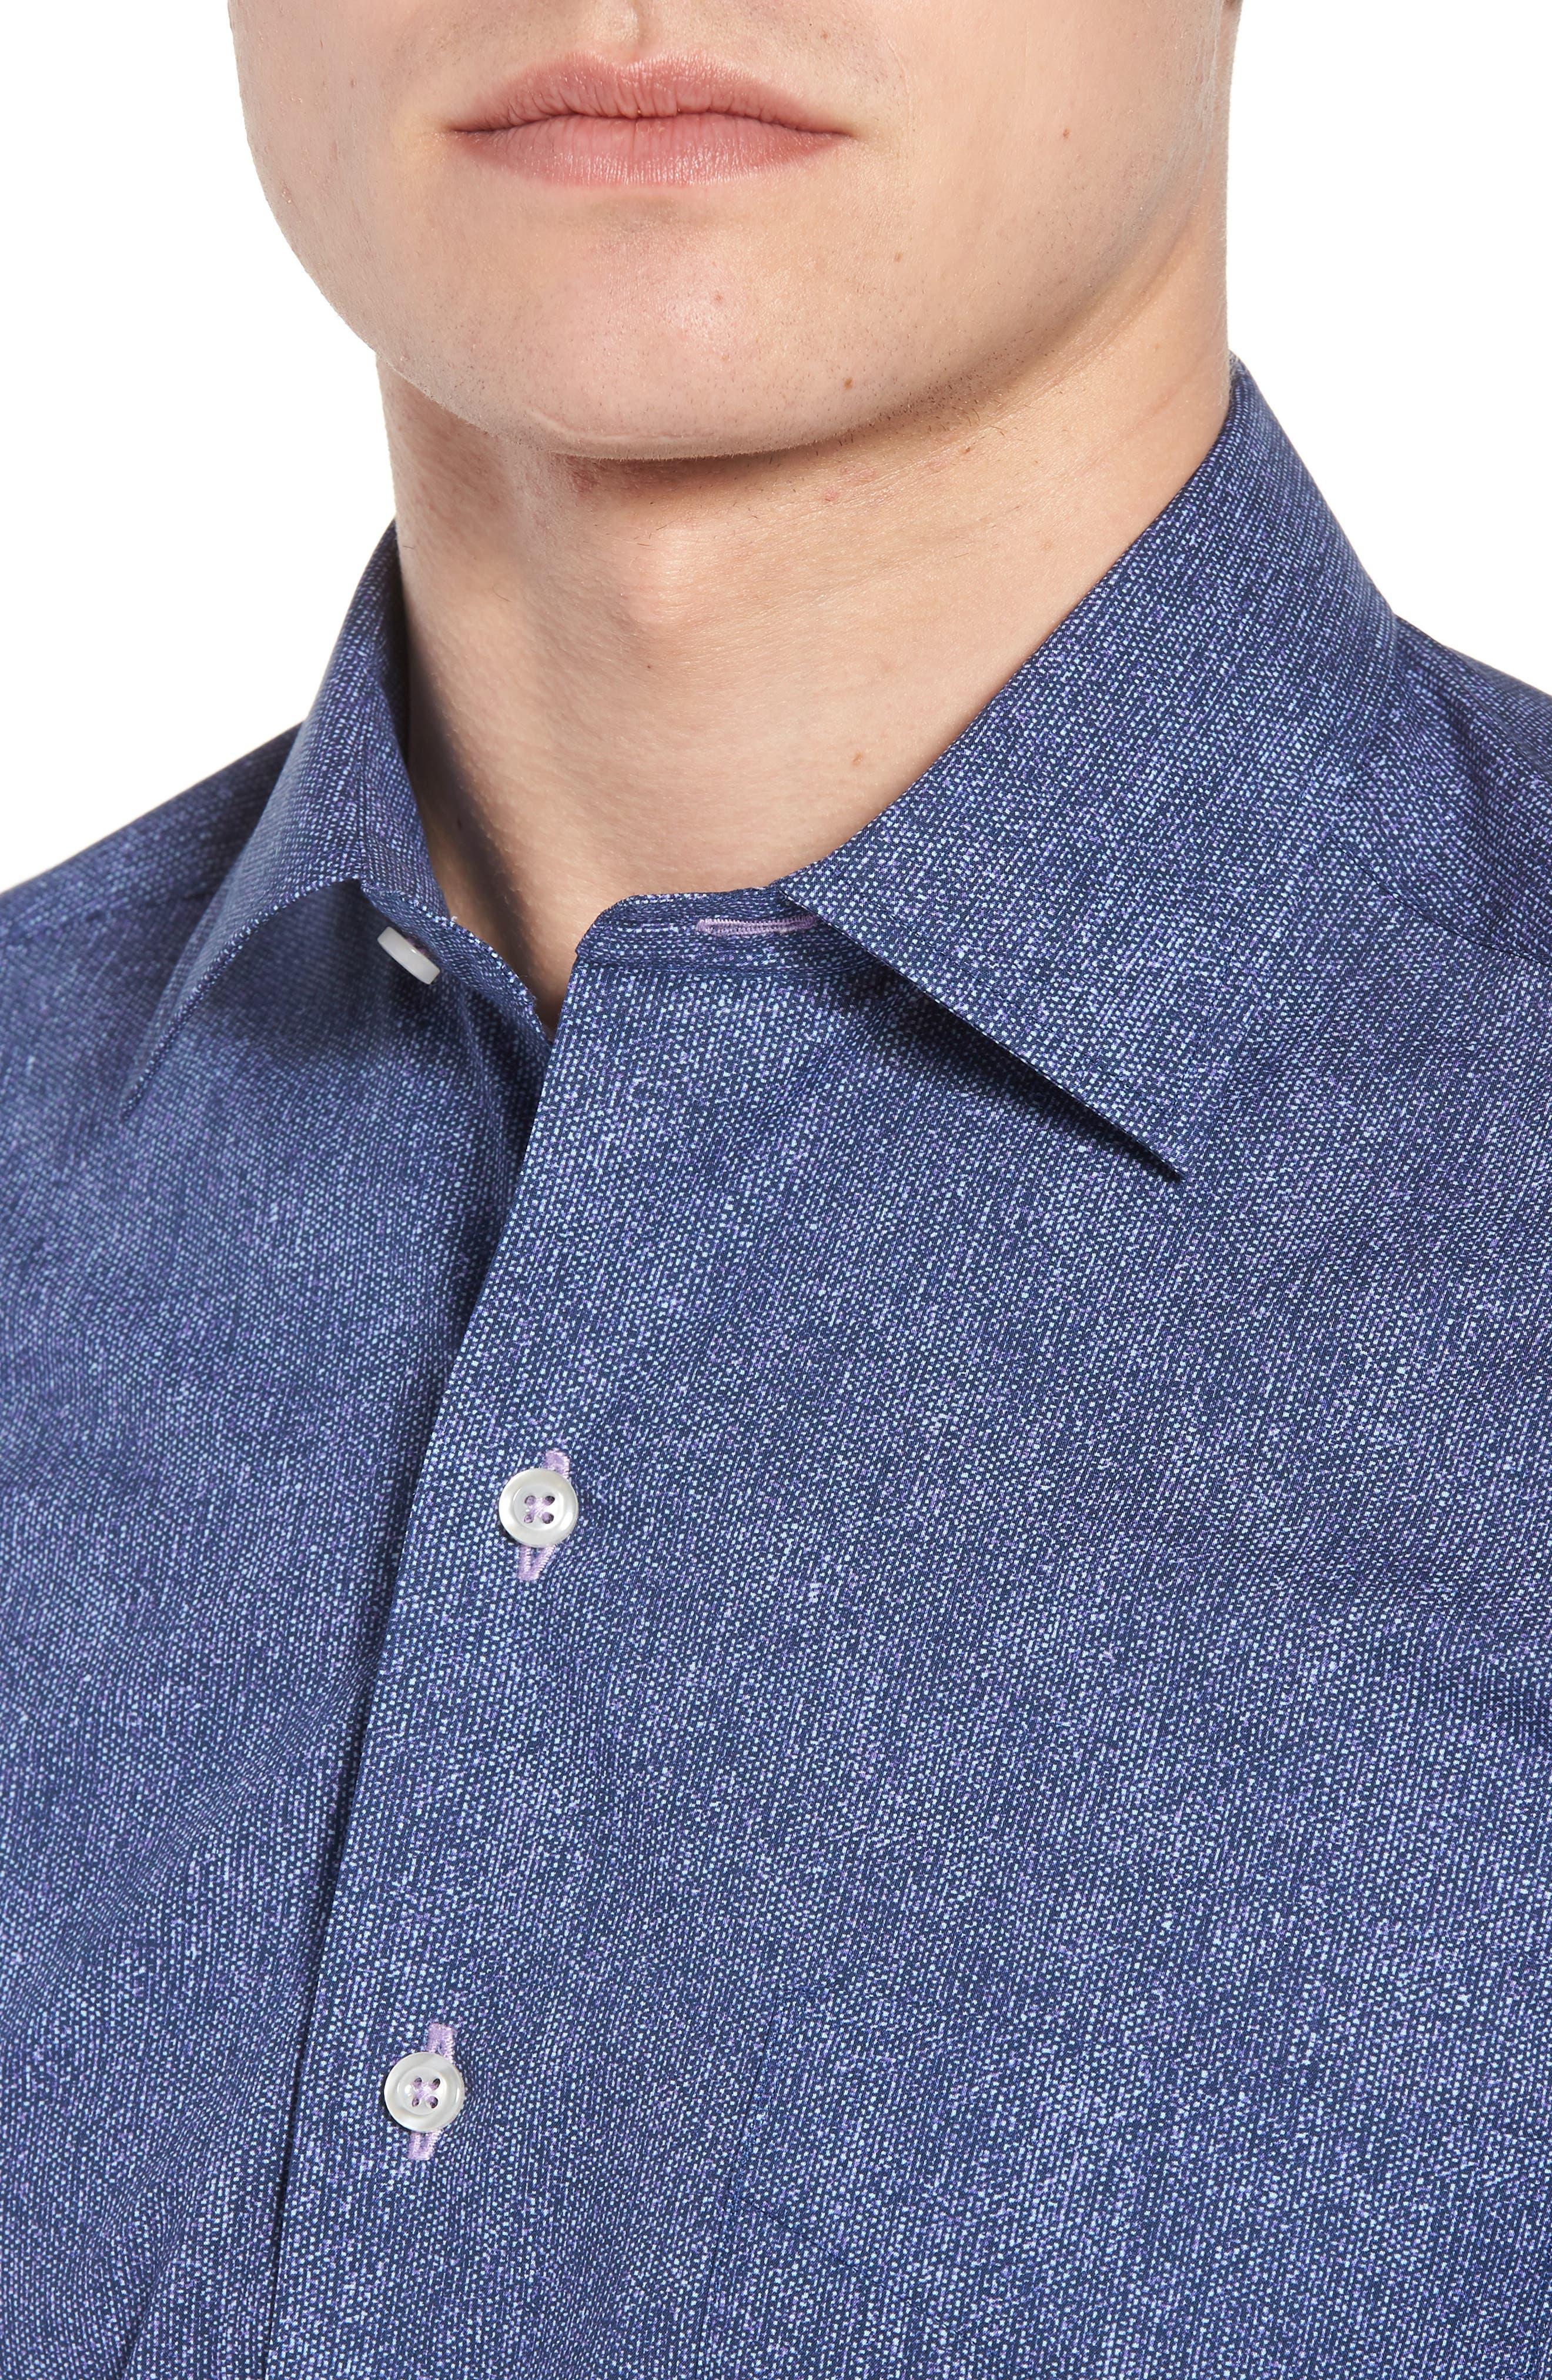 Regular Fit Microprint Sport Shirt,                             Alternate thumbnail 4, color,                             Navy/ Purple